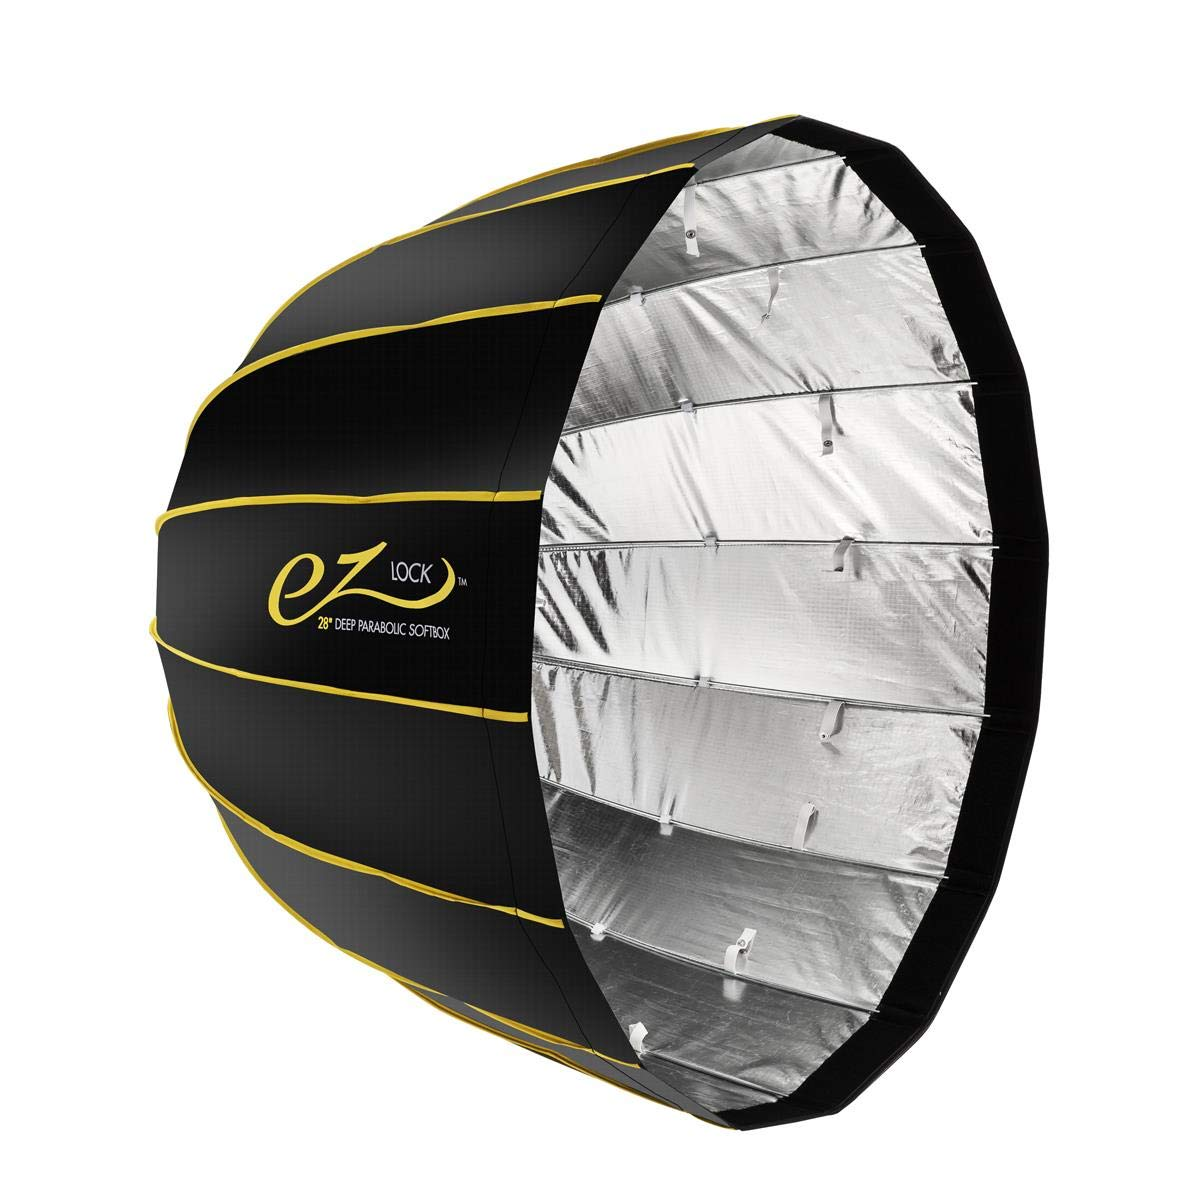 Glow EZ Lock Deep Parabolic Quick Softbox (28'') by Glow